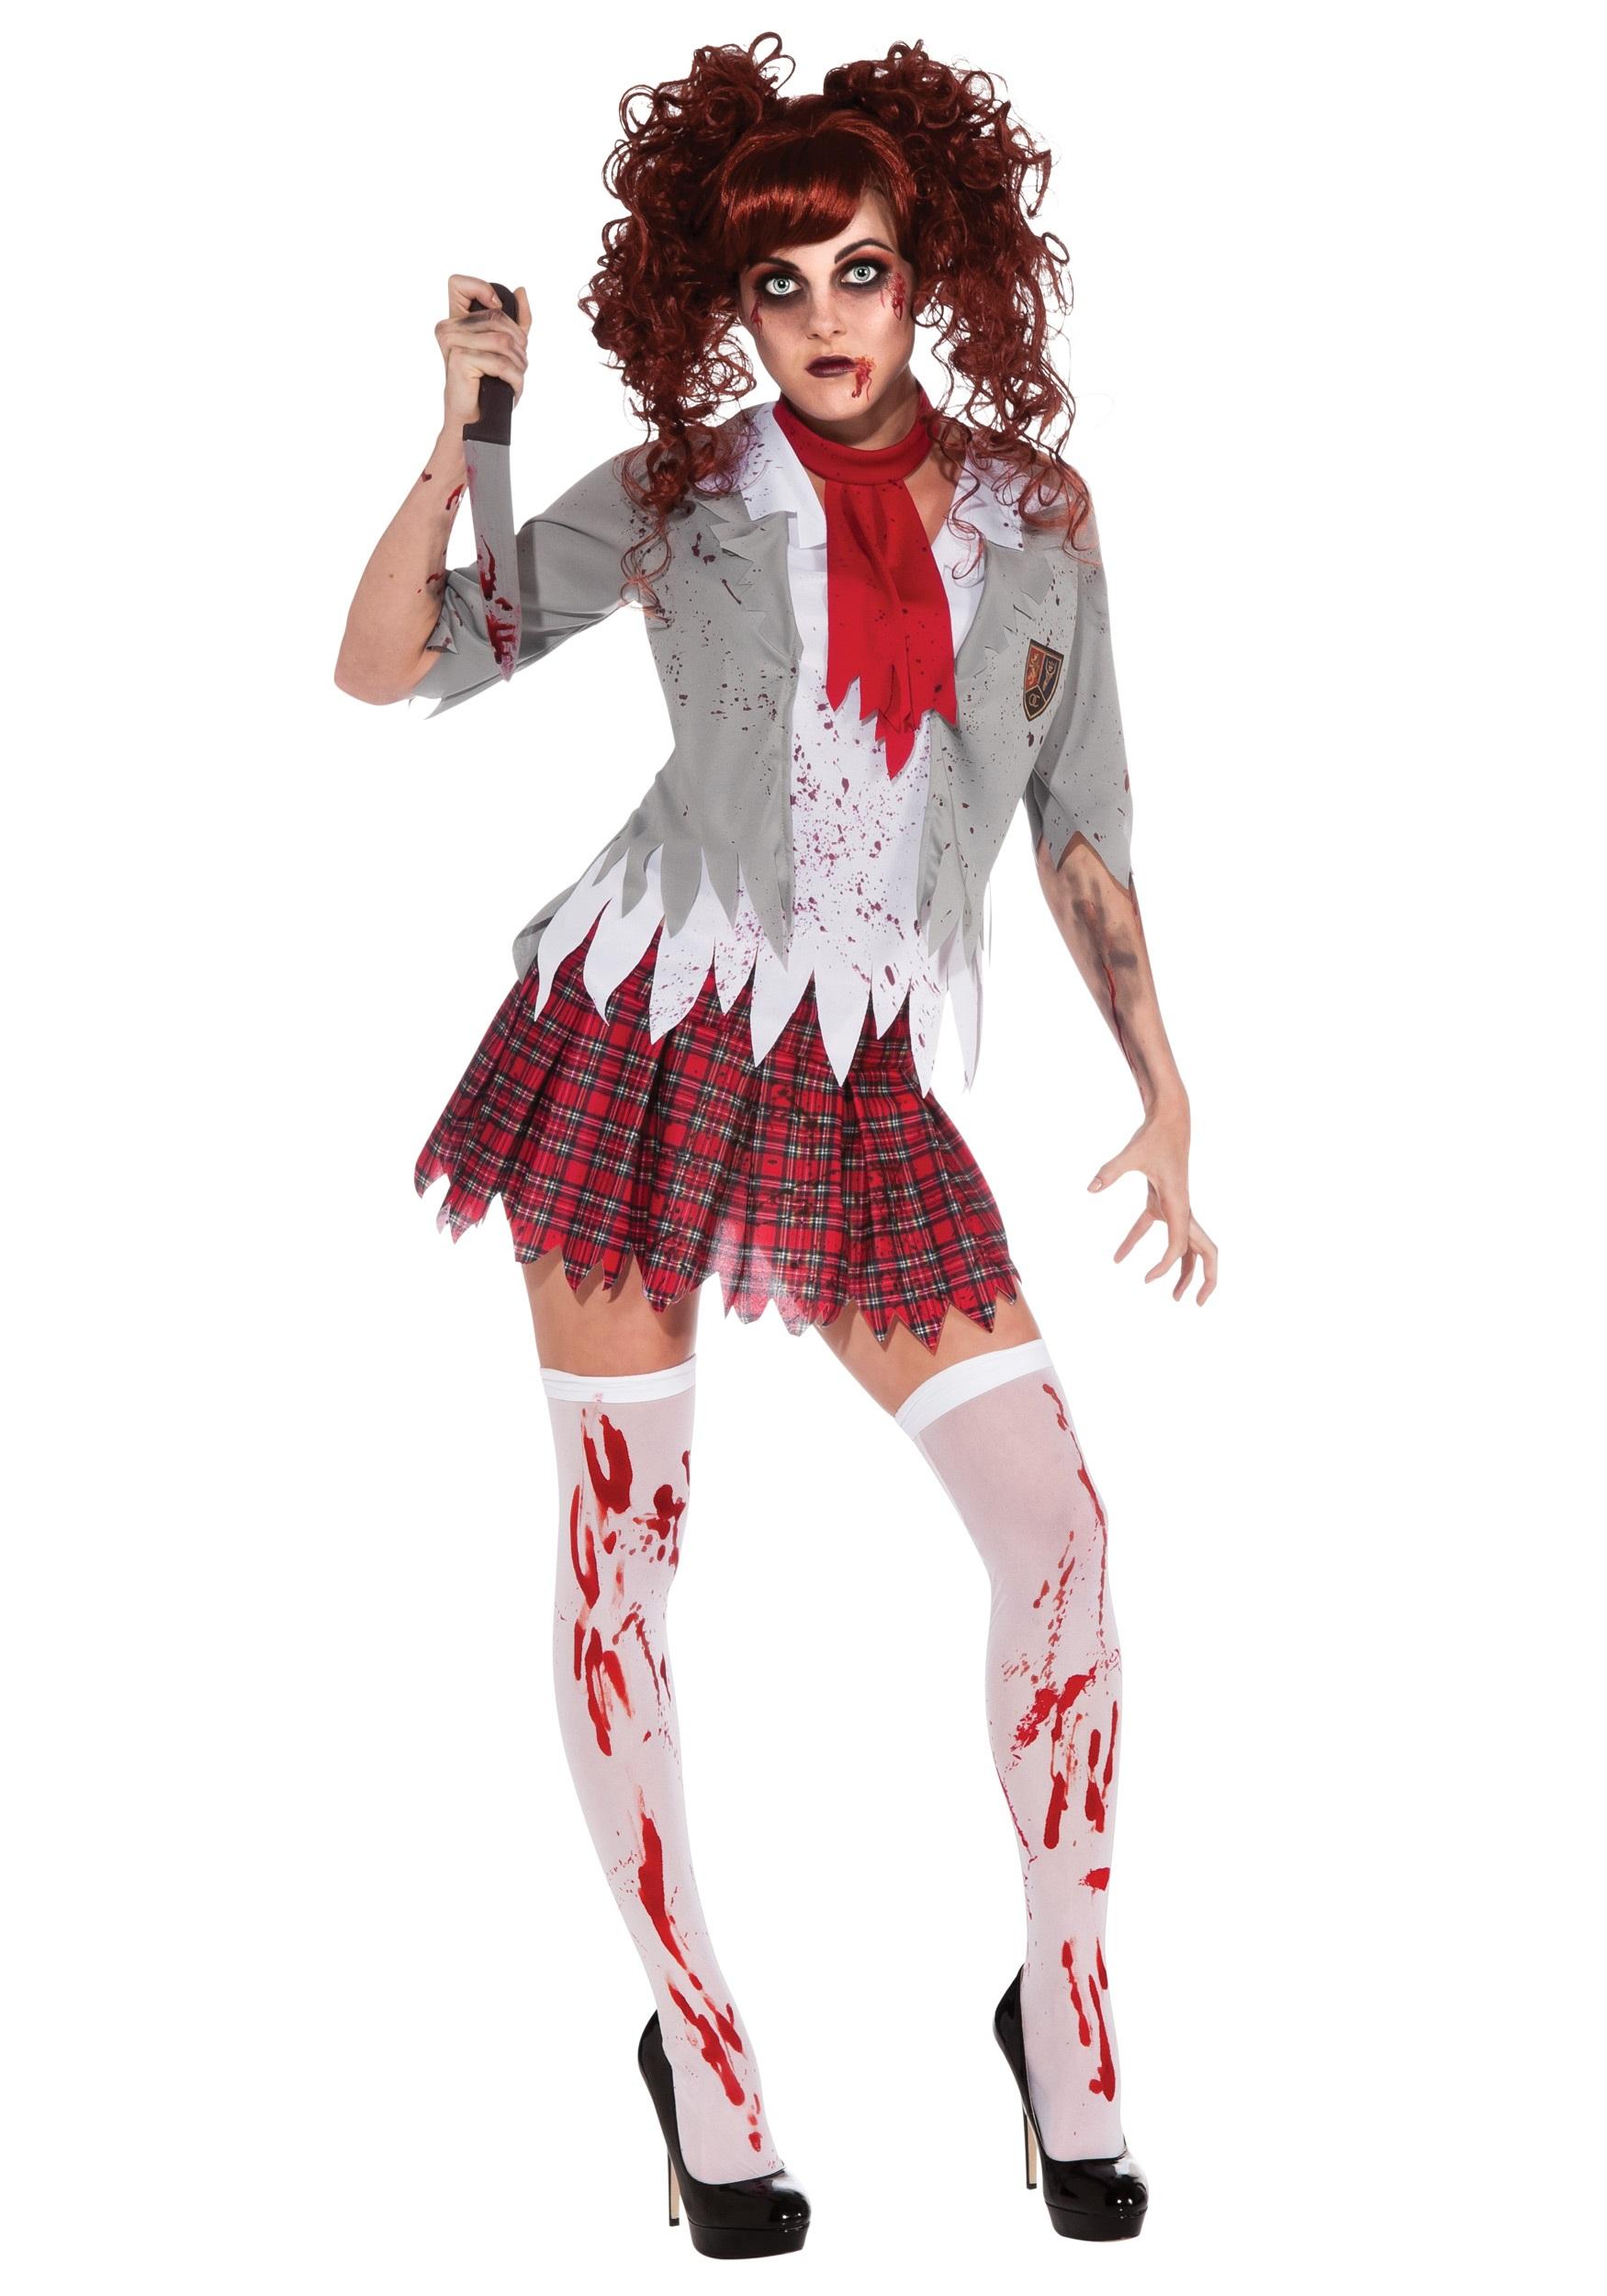 Sexy Zombie Costumes  Buy Sexy Zombie Costumes At Costumevip-9121